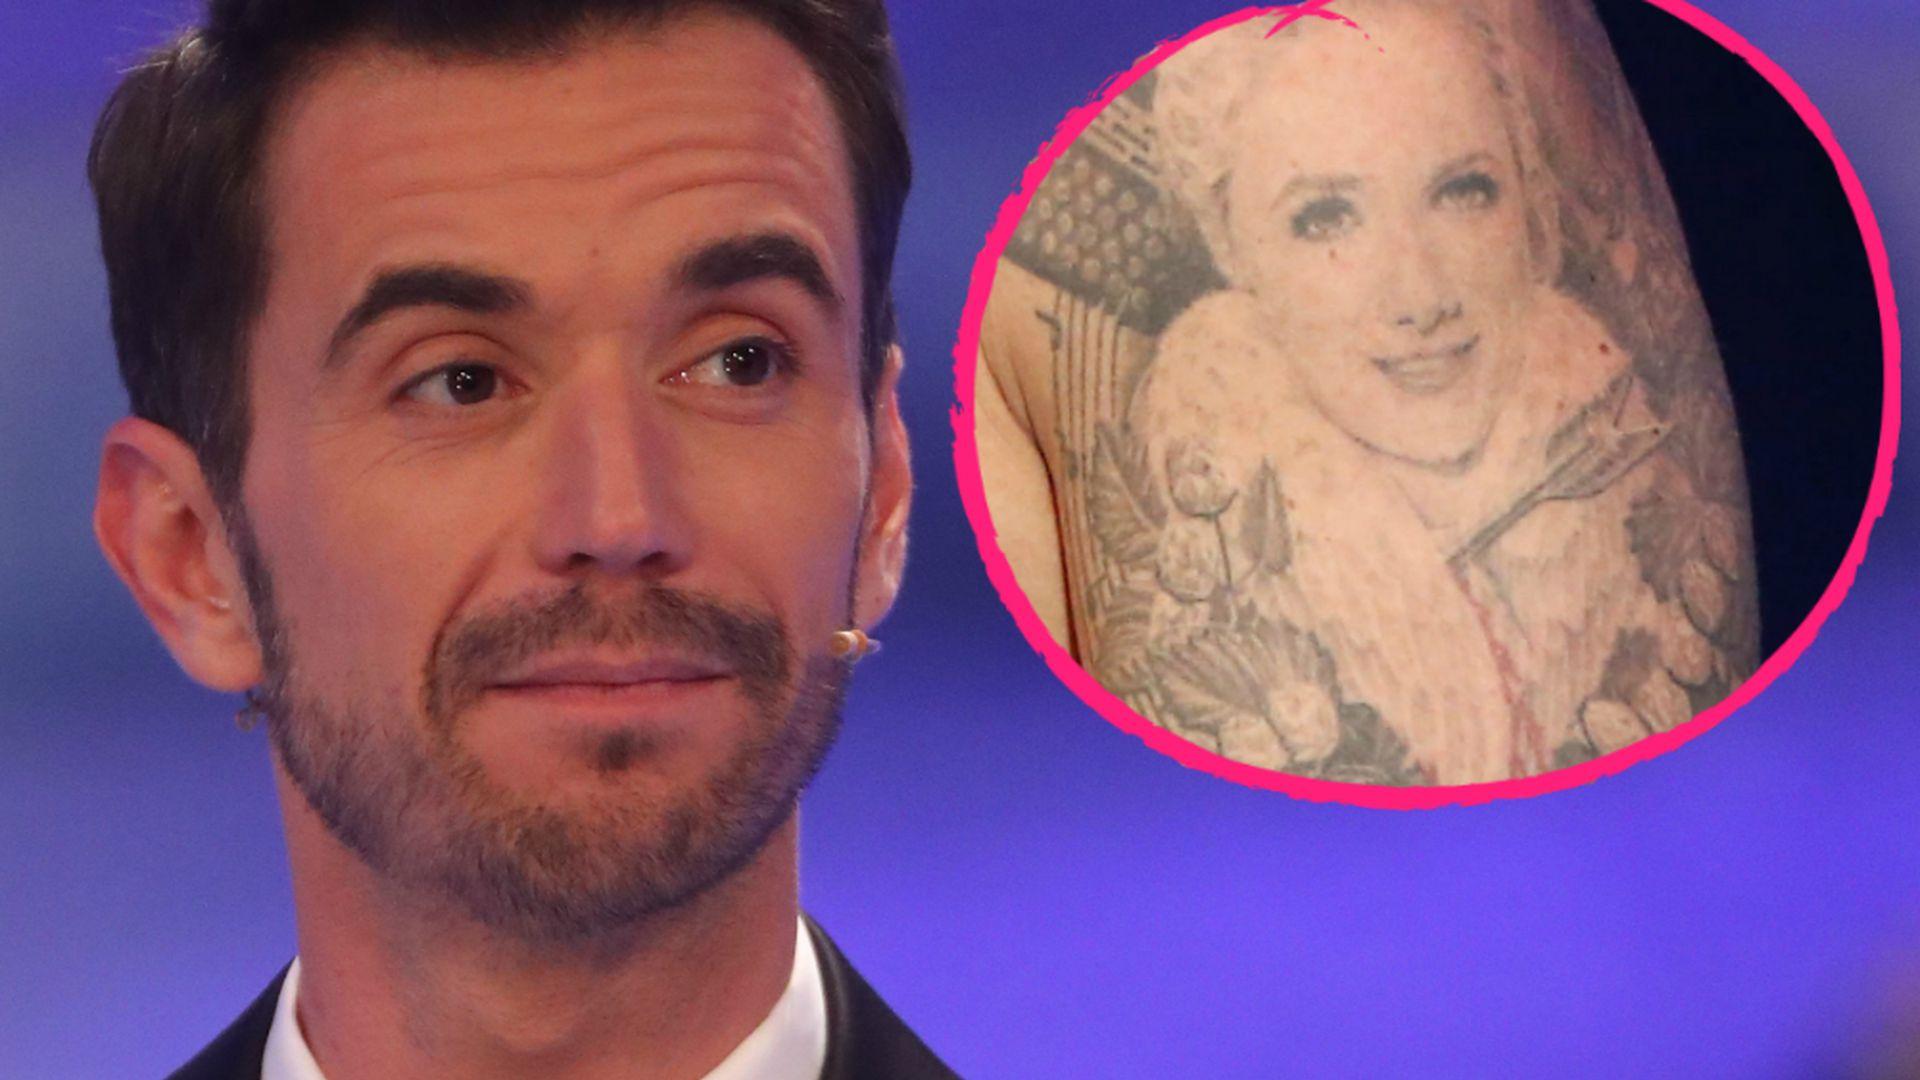 Florian Silbereisen Tattoo Pfeil